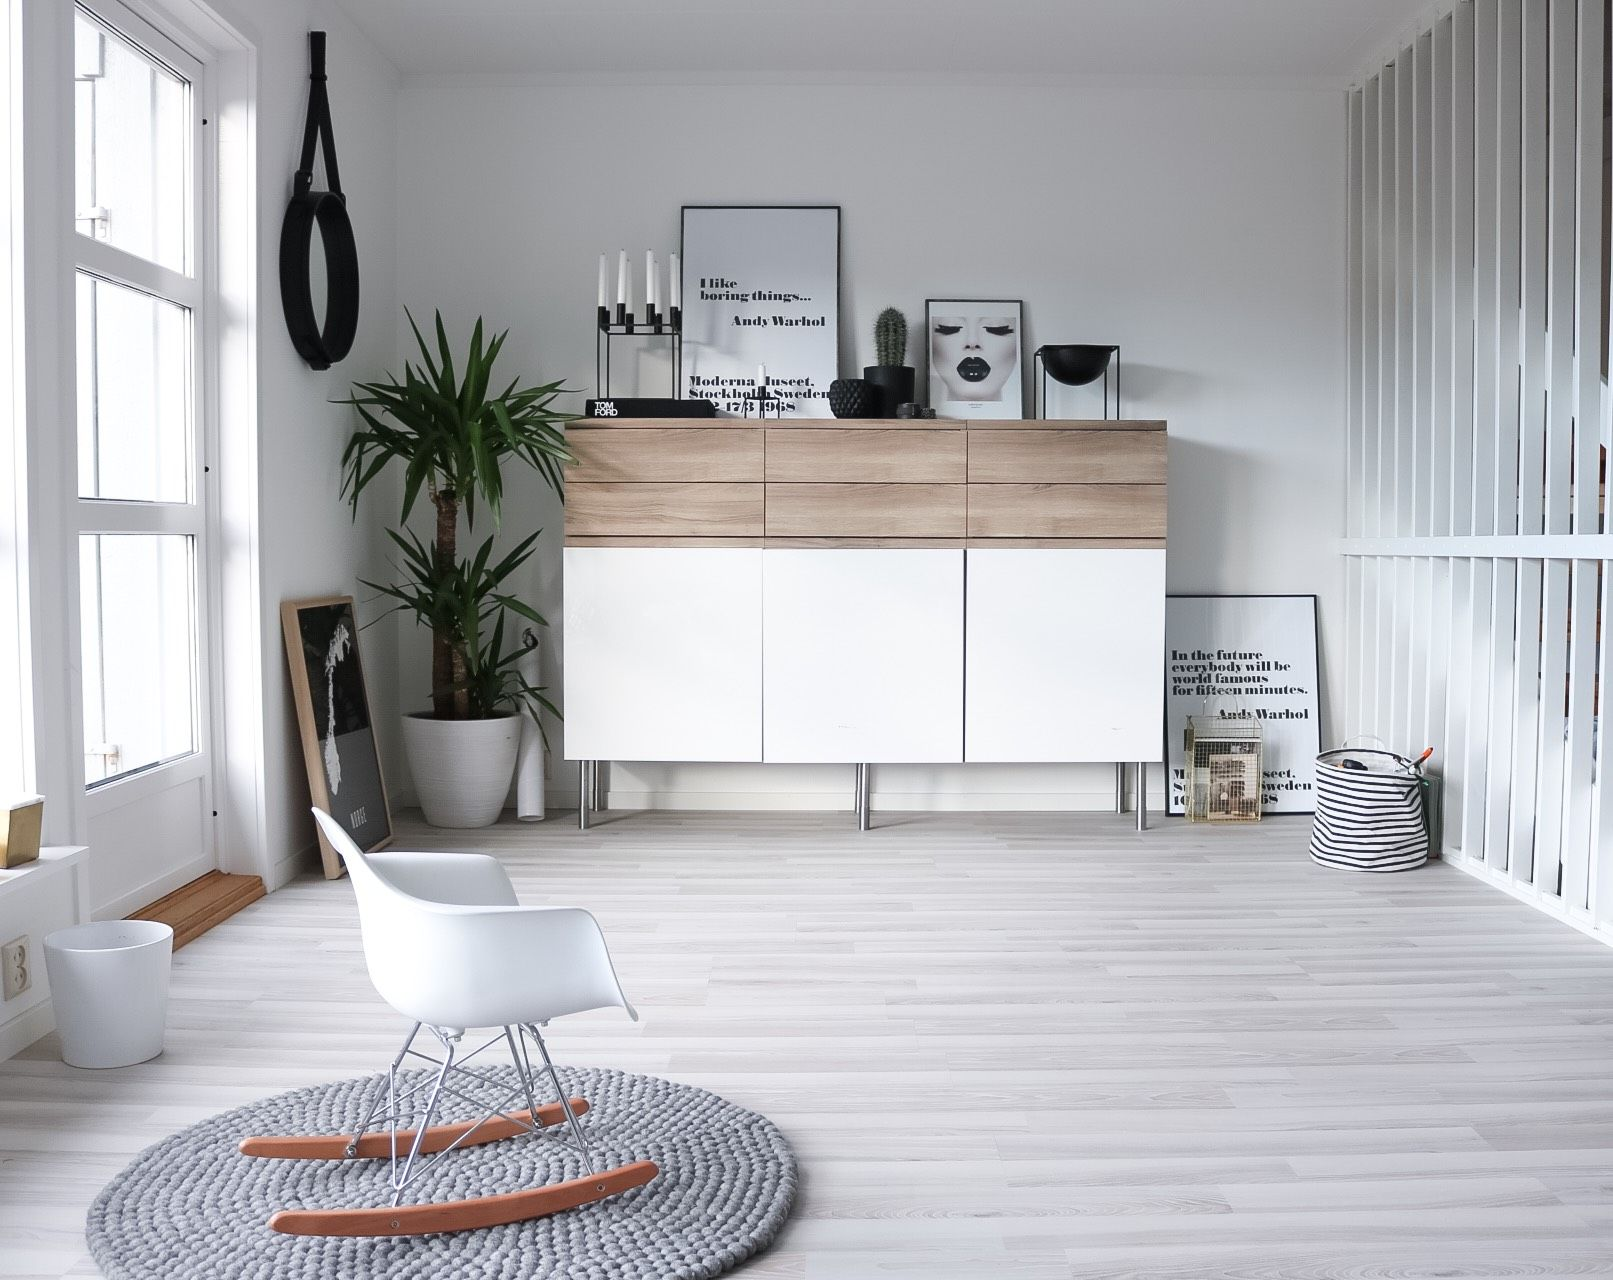 Instagram Hvitelinjer Interior Inspiration Scandinavian Nepaldo Jollyroom Ikea